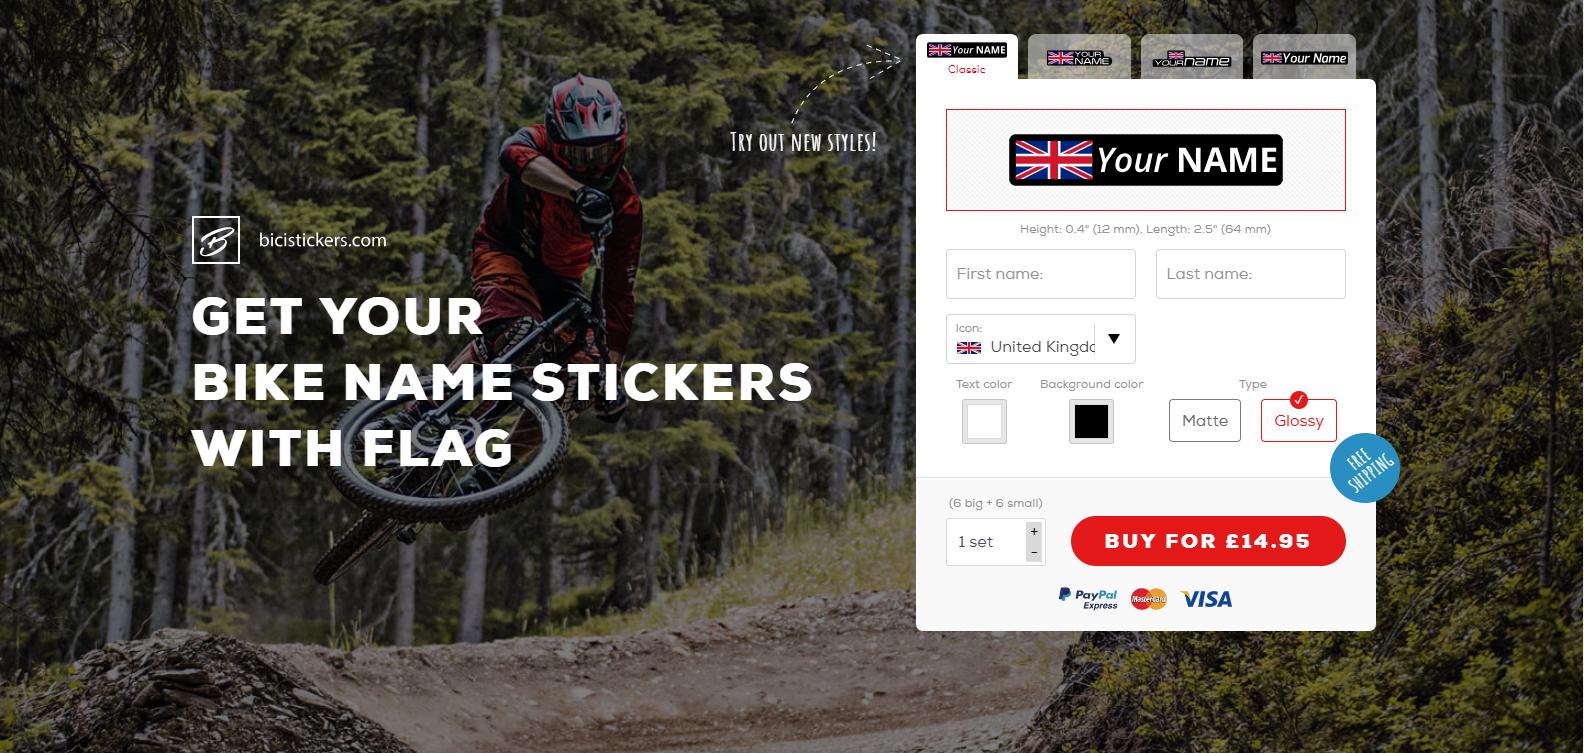 Bicistickers-Bike-Stickers